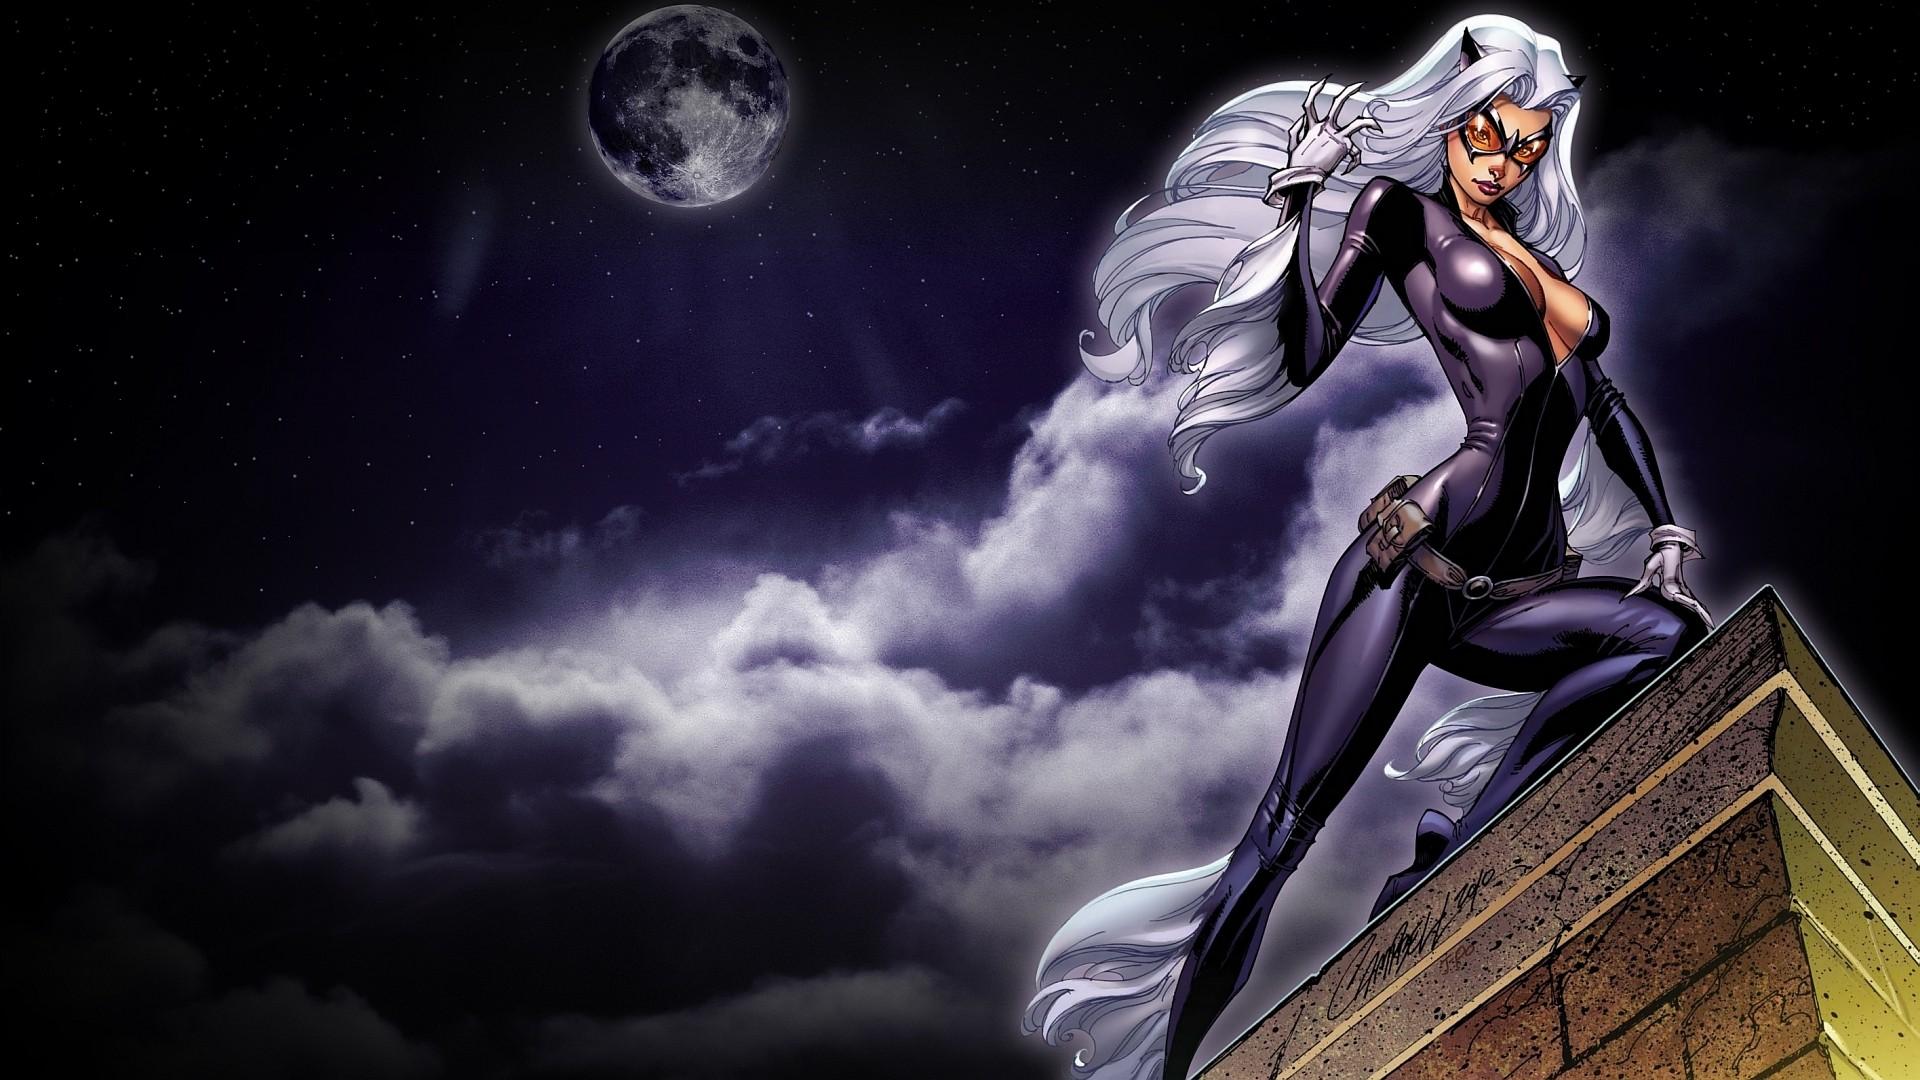 Catwoman Wallpaper Full HD